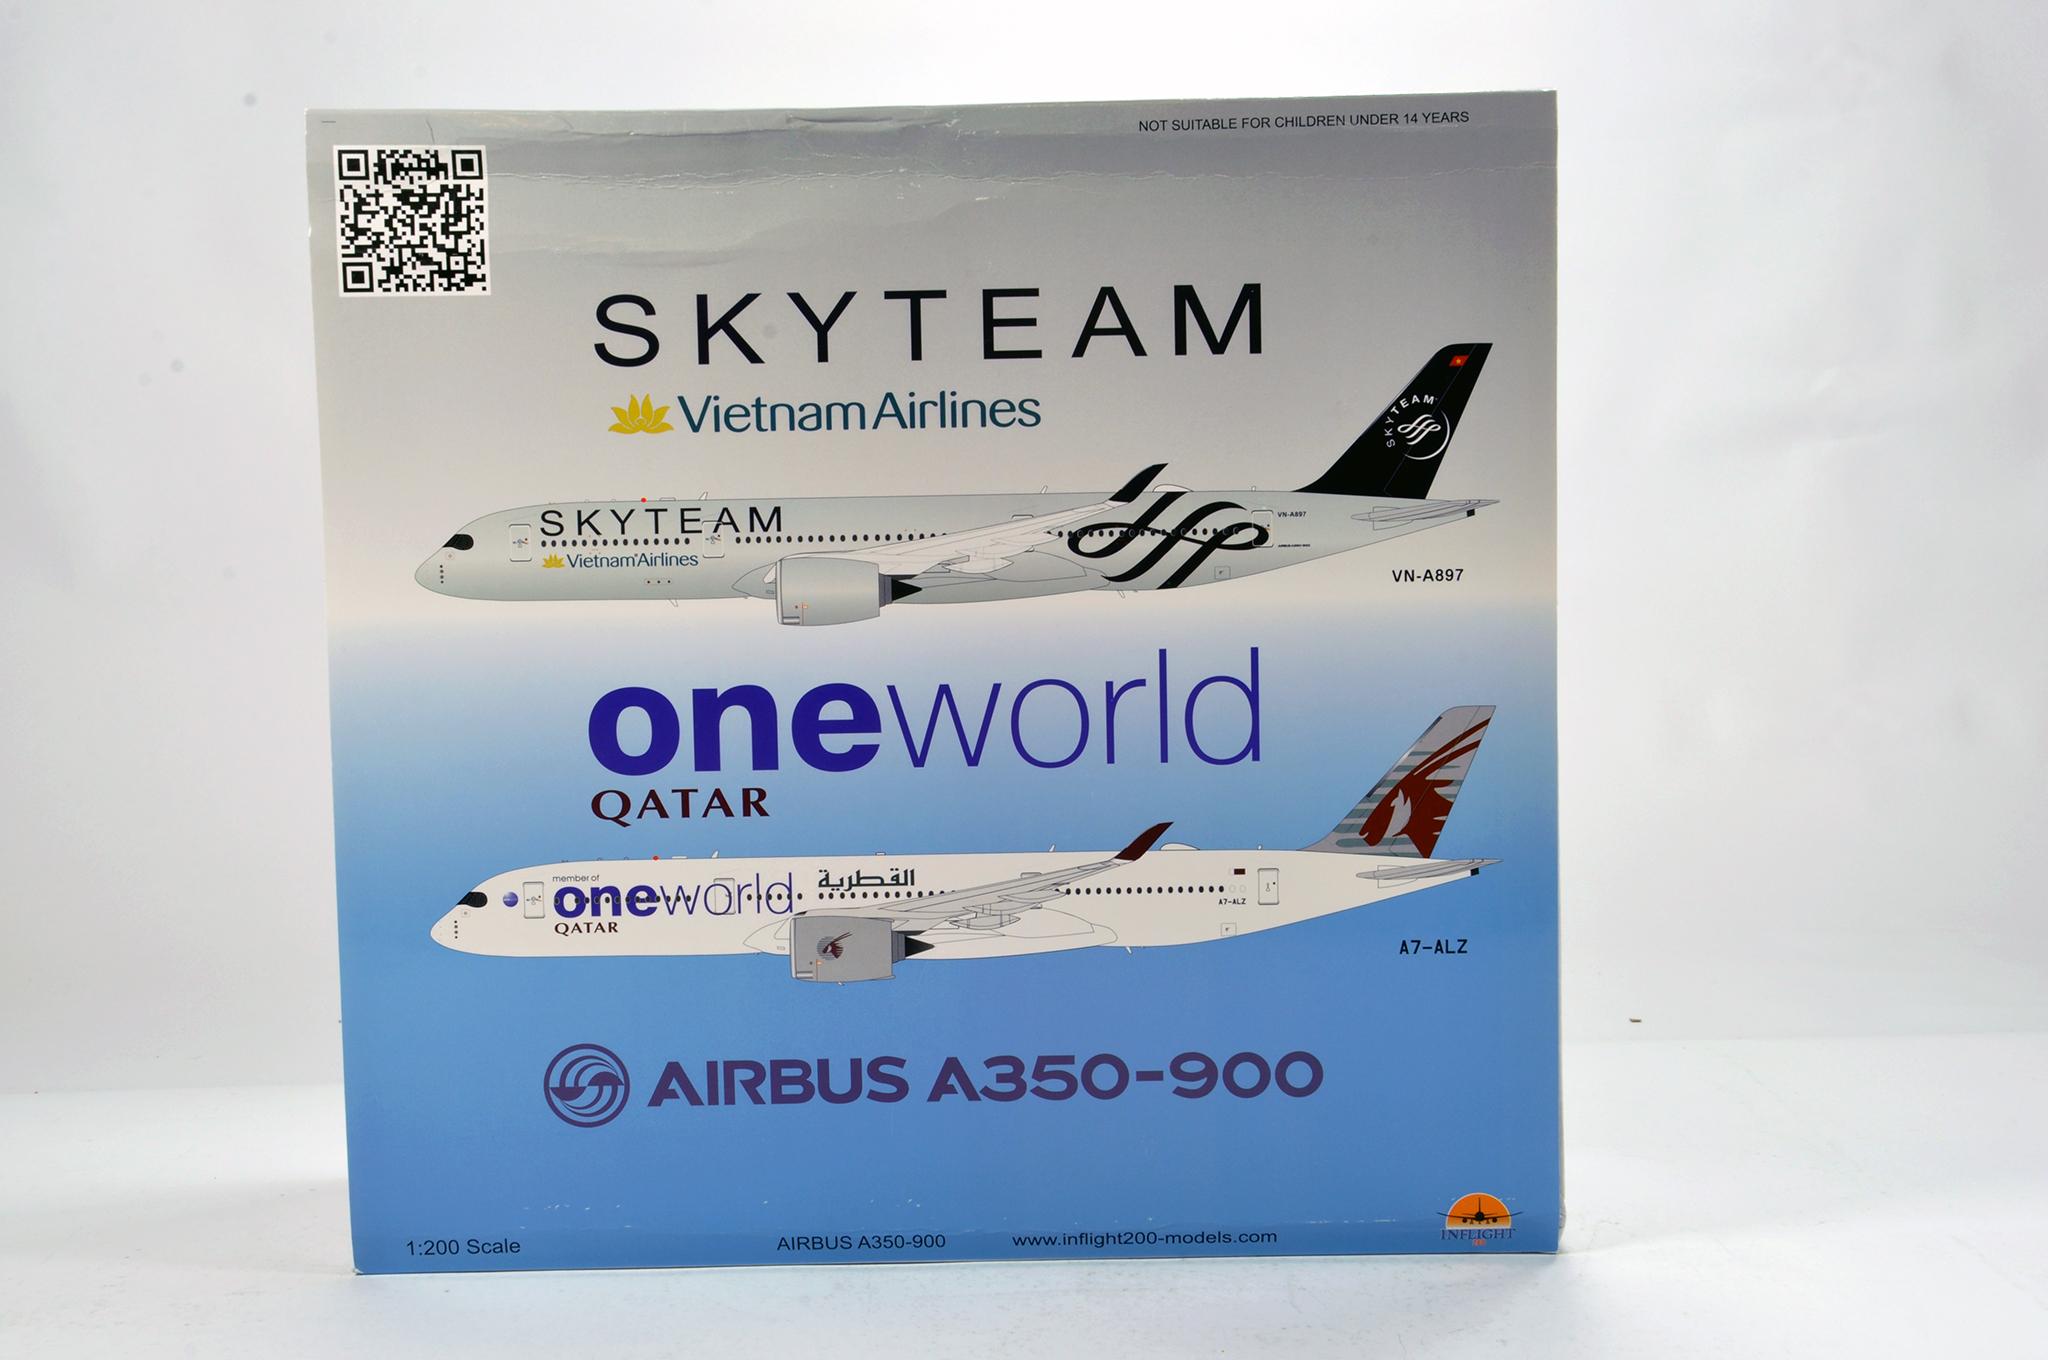 Lot 46 - Inflight Models 1/200 Diecast Aircraft Models comprising Airbus A350-900. Graded ex shop stock. A to